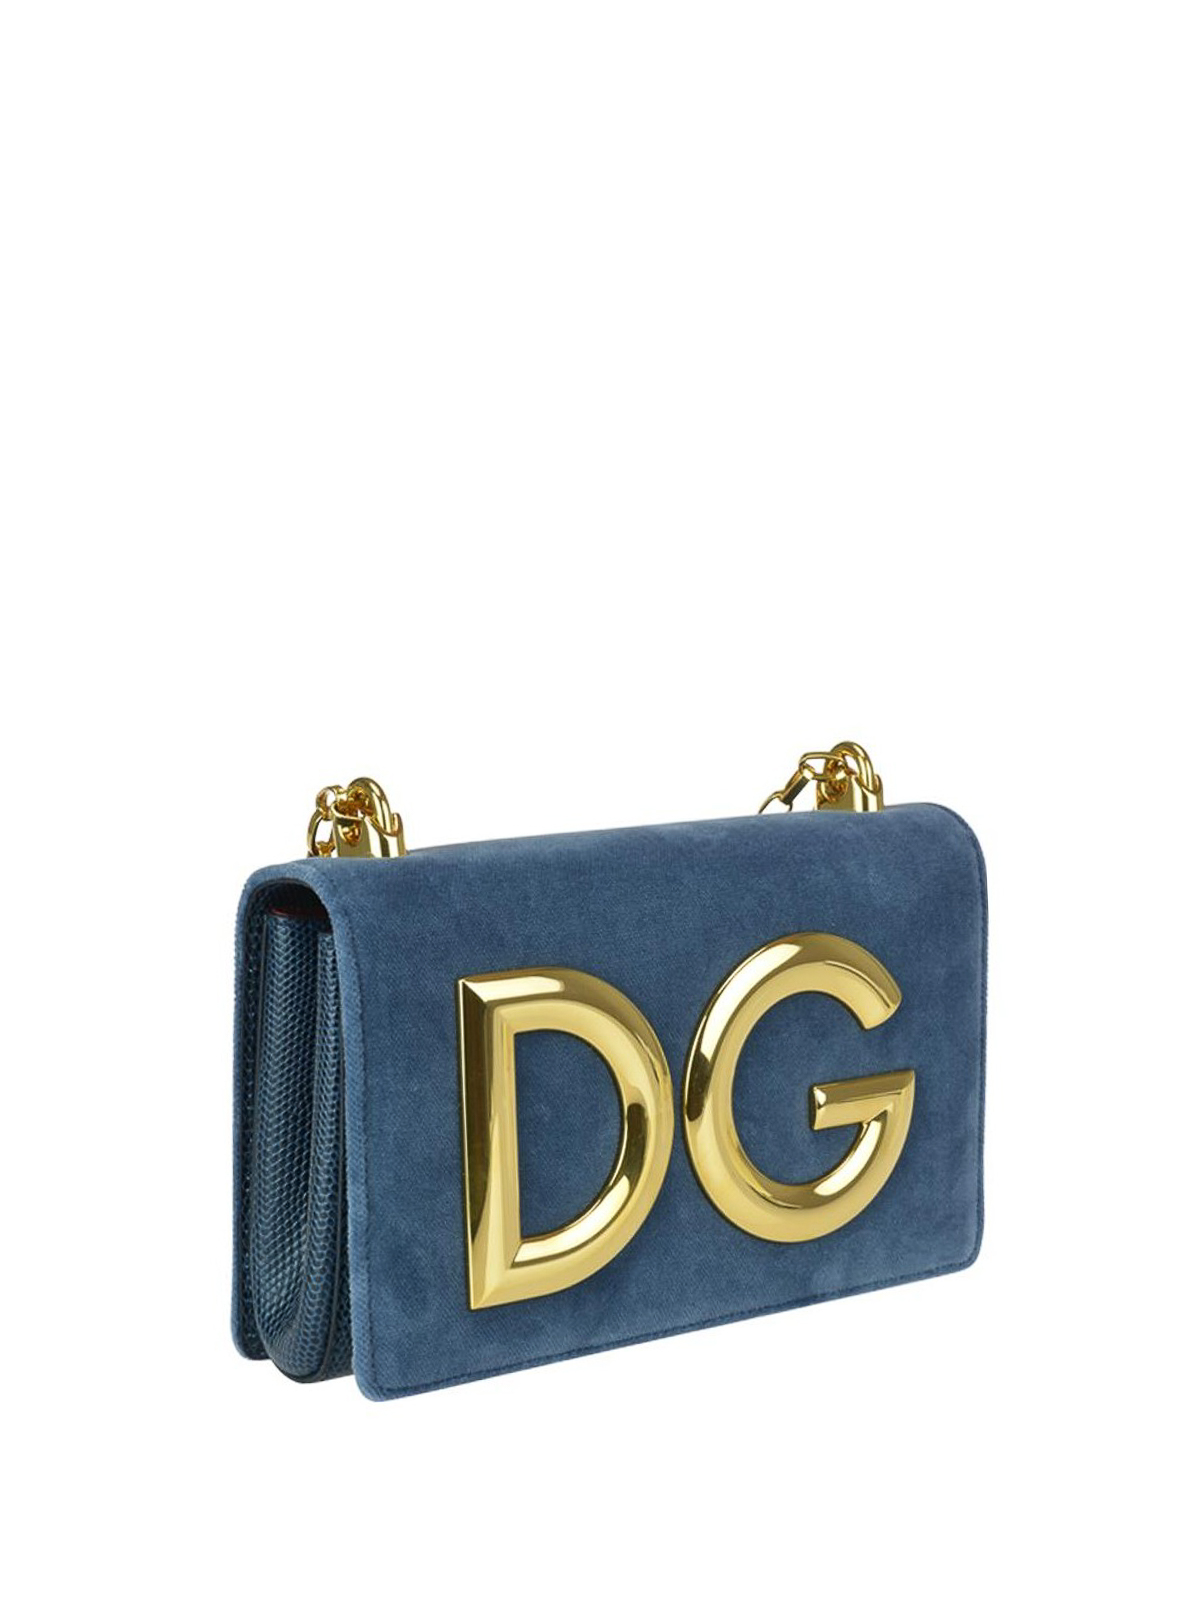 0ed744b470 DOLCE   GABBANA  shoulder bags online - Velvet and reptile print leather DG  Girls bag